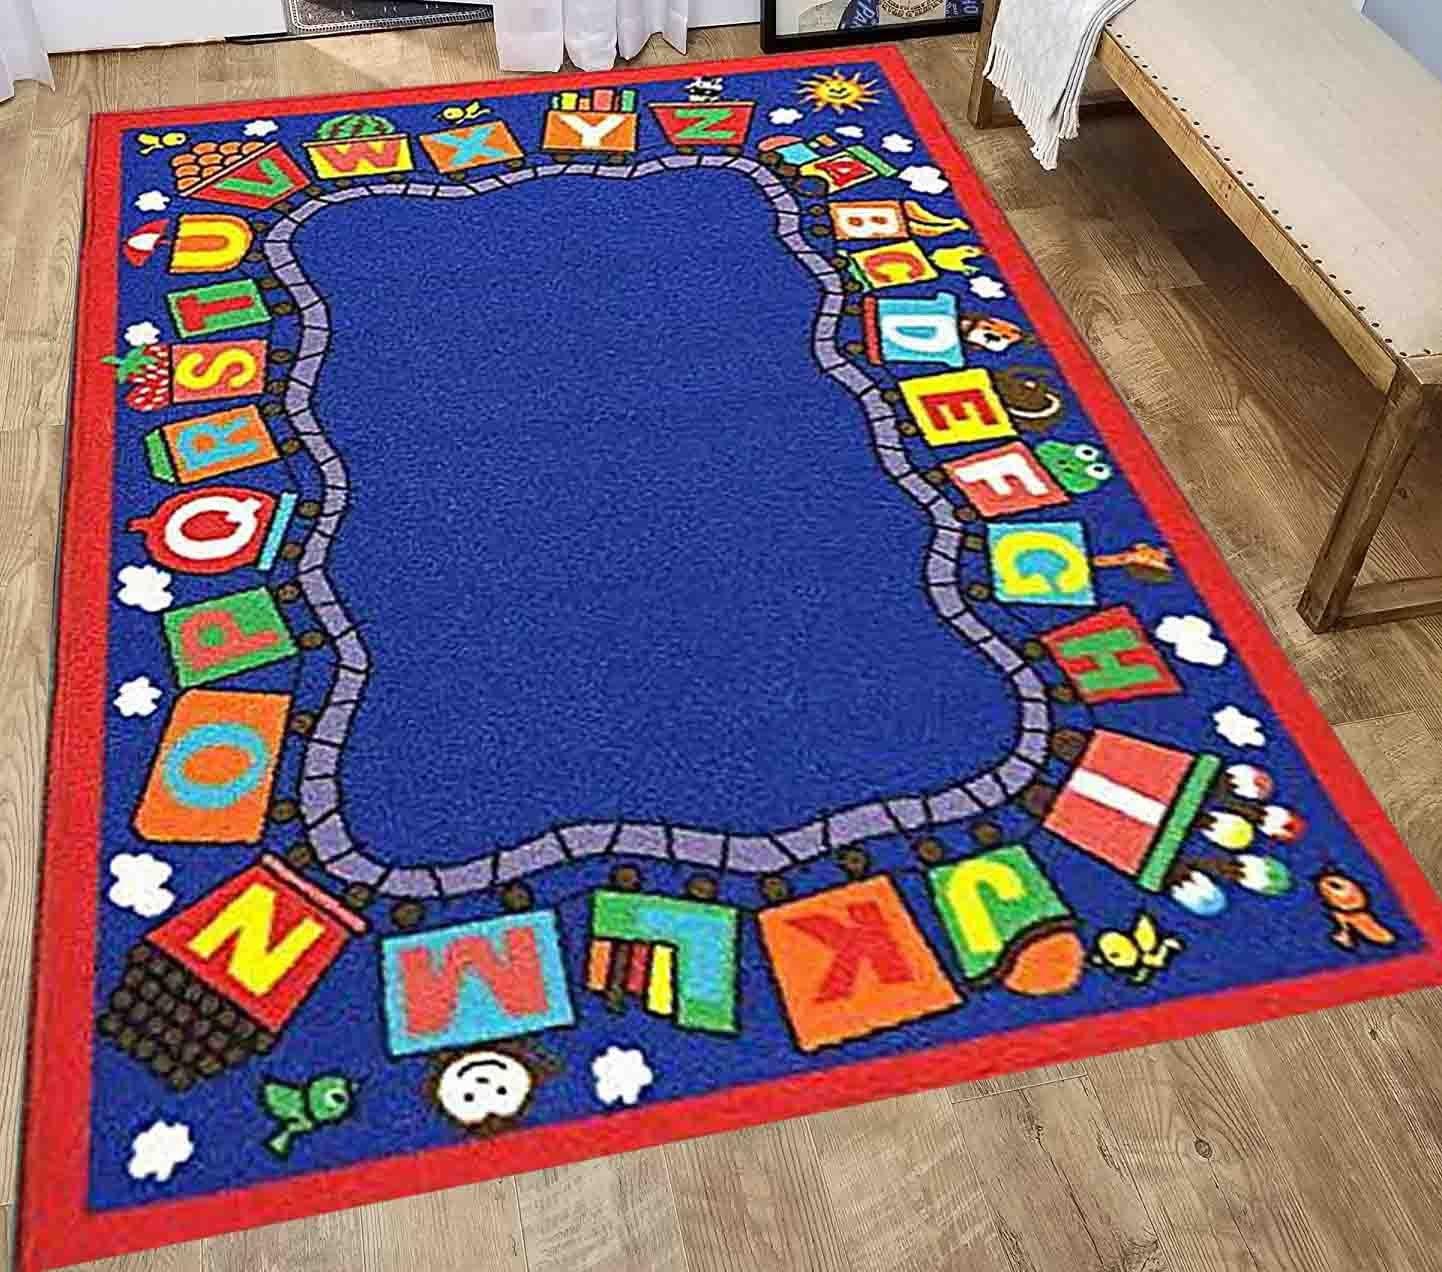 5x7 New Kids Boys Children Toddler Playroom Nursery Room Bedroom Fun Educational Game School Toys ABC Alphabet Train Area Rug Carpet Colorful Decorative Designer Sale Discount Cheap Sale ( Train )